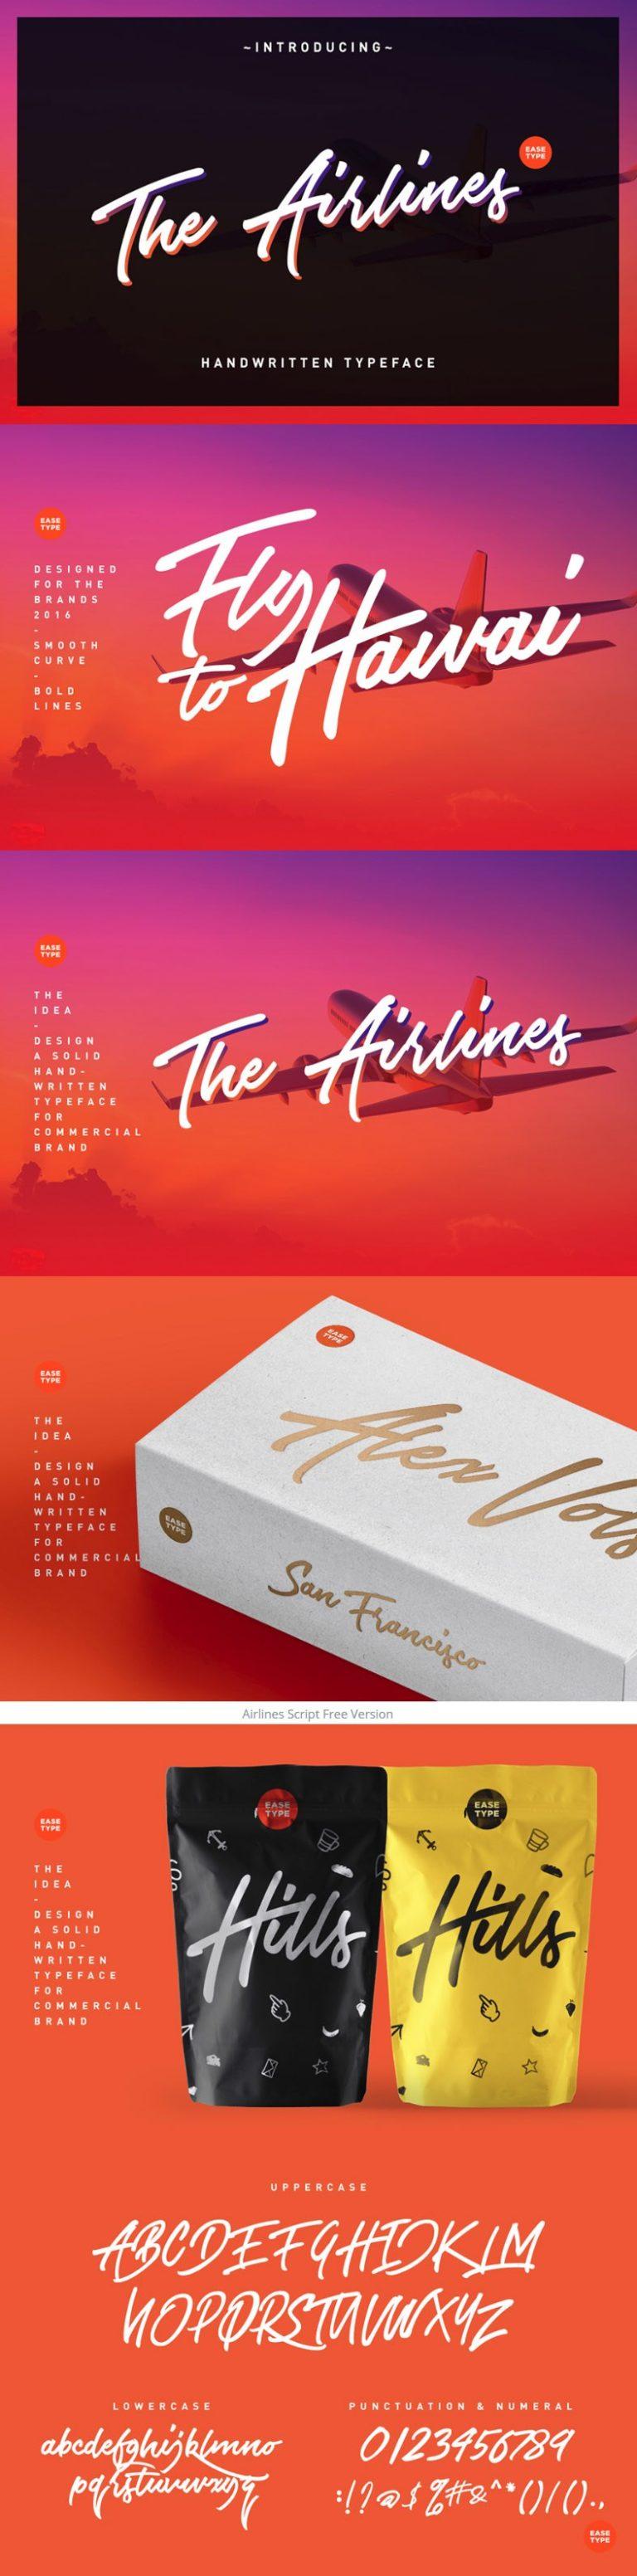 airlines-download-0.jpg download